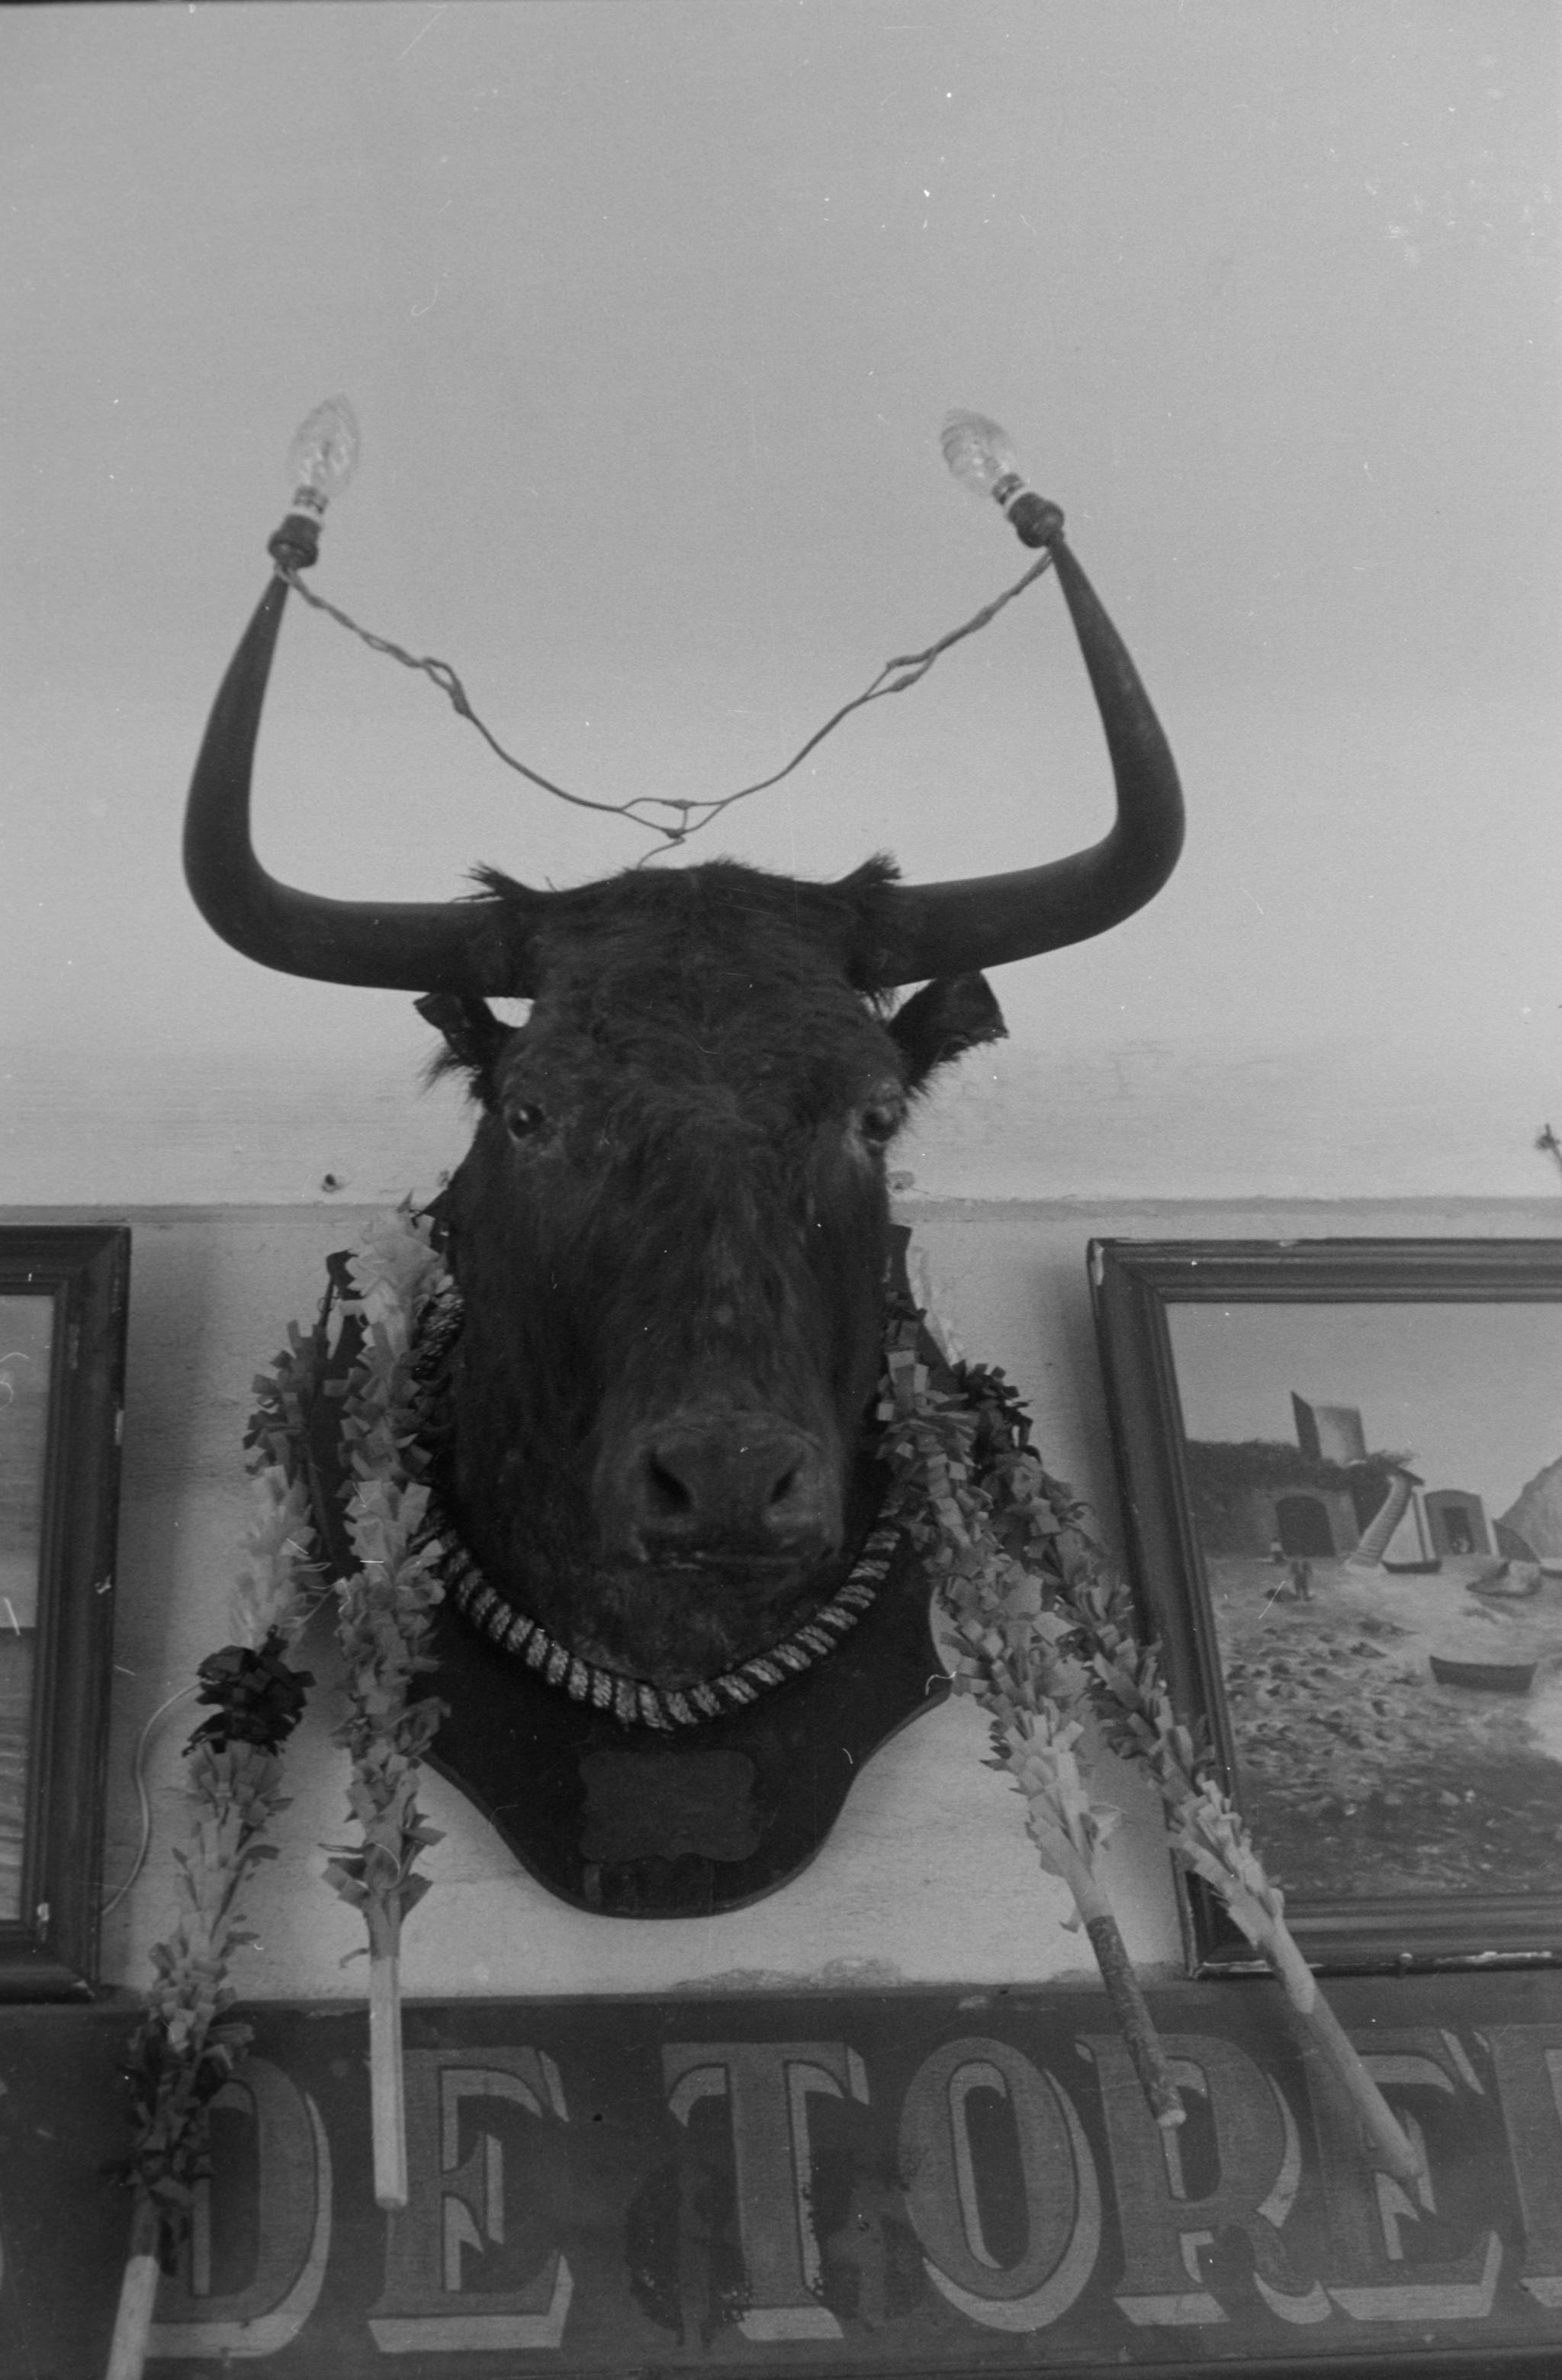 Jerez de la frontera, 1959<br/>30 x 40 cm